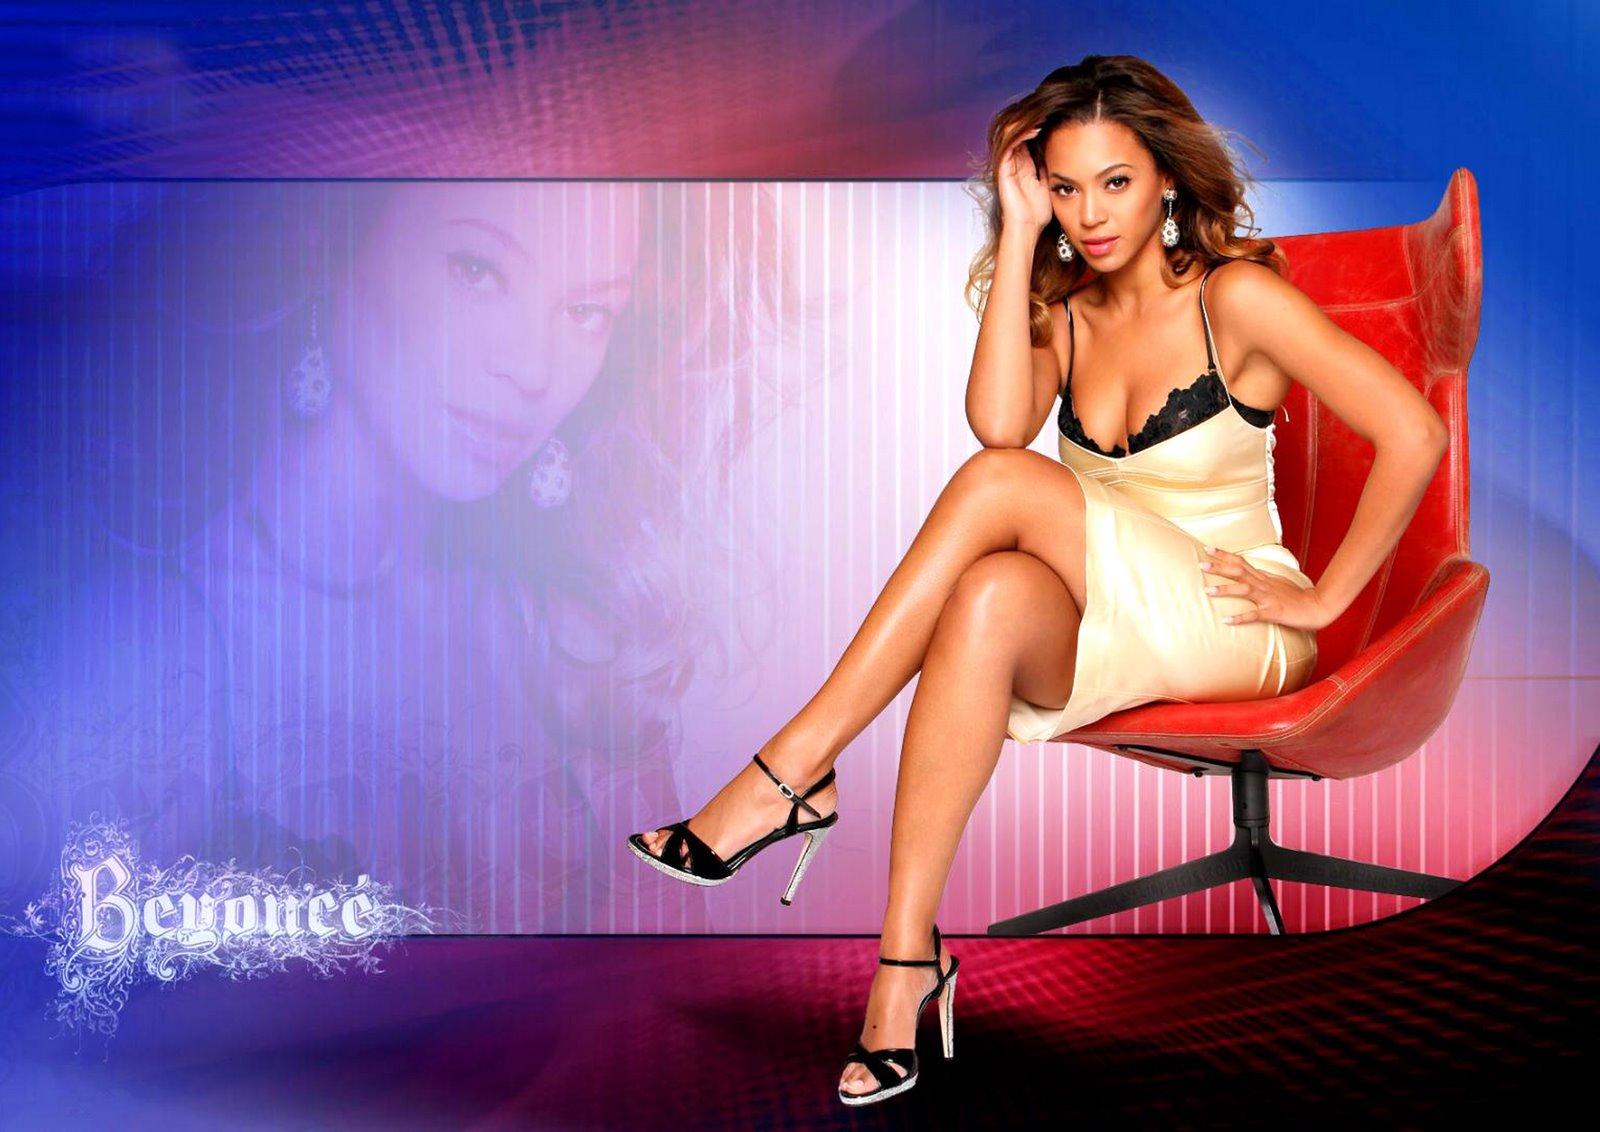 http://3.bp.blogspot.com/_kz5tggJUhu8/Ry8MNF8plmI/AAAAAAAAAFc/W4aCaLJXd_c/s1600/Beyonce+Knowles+1.jpg